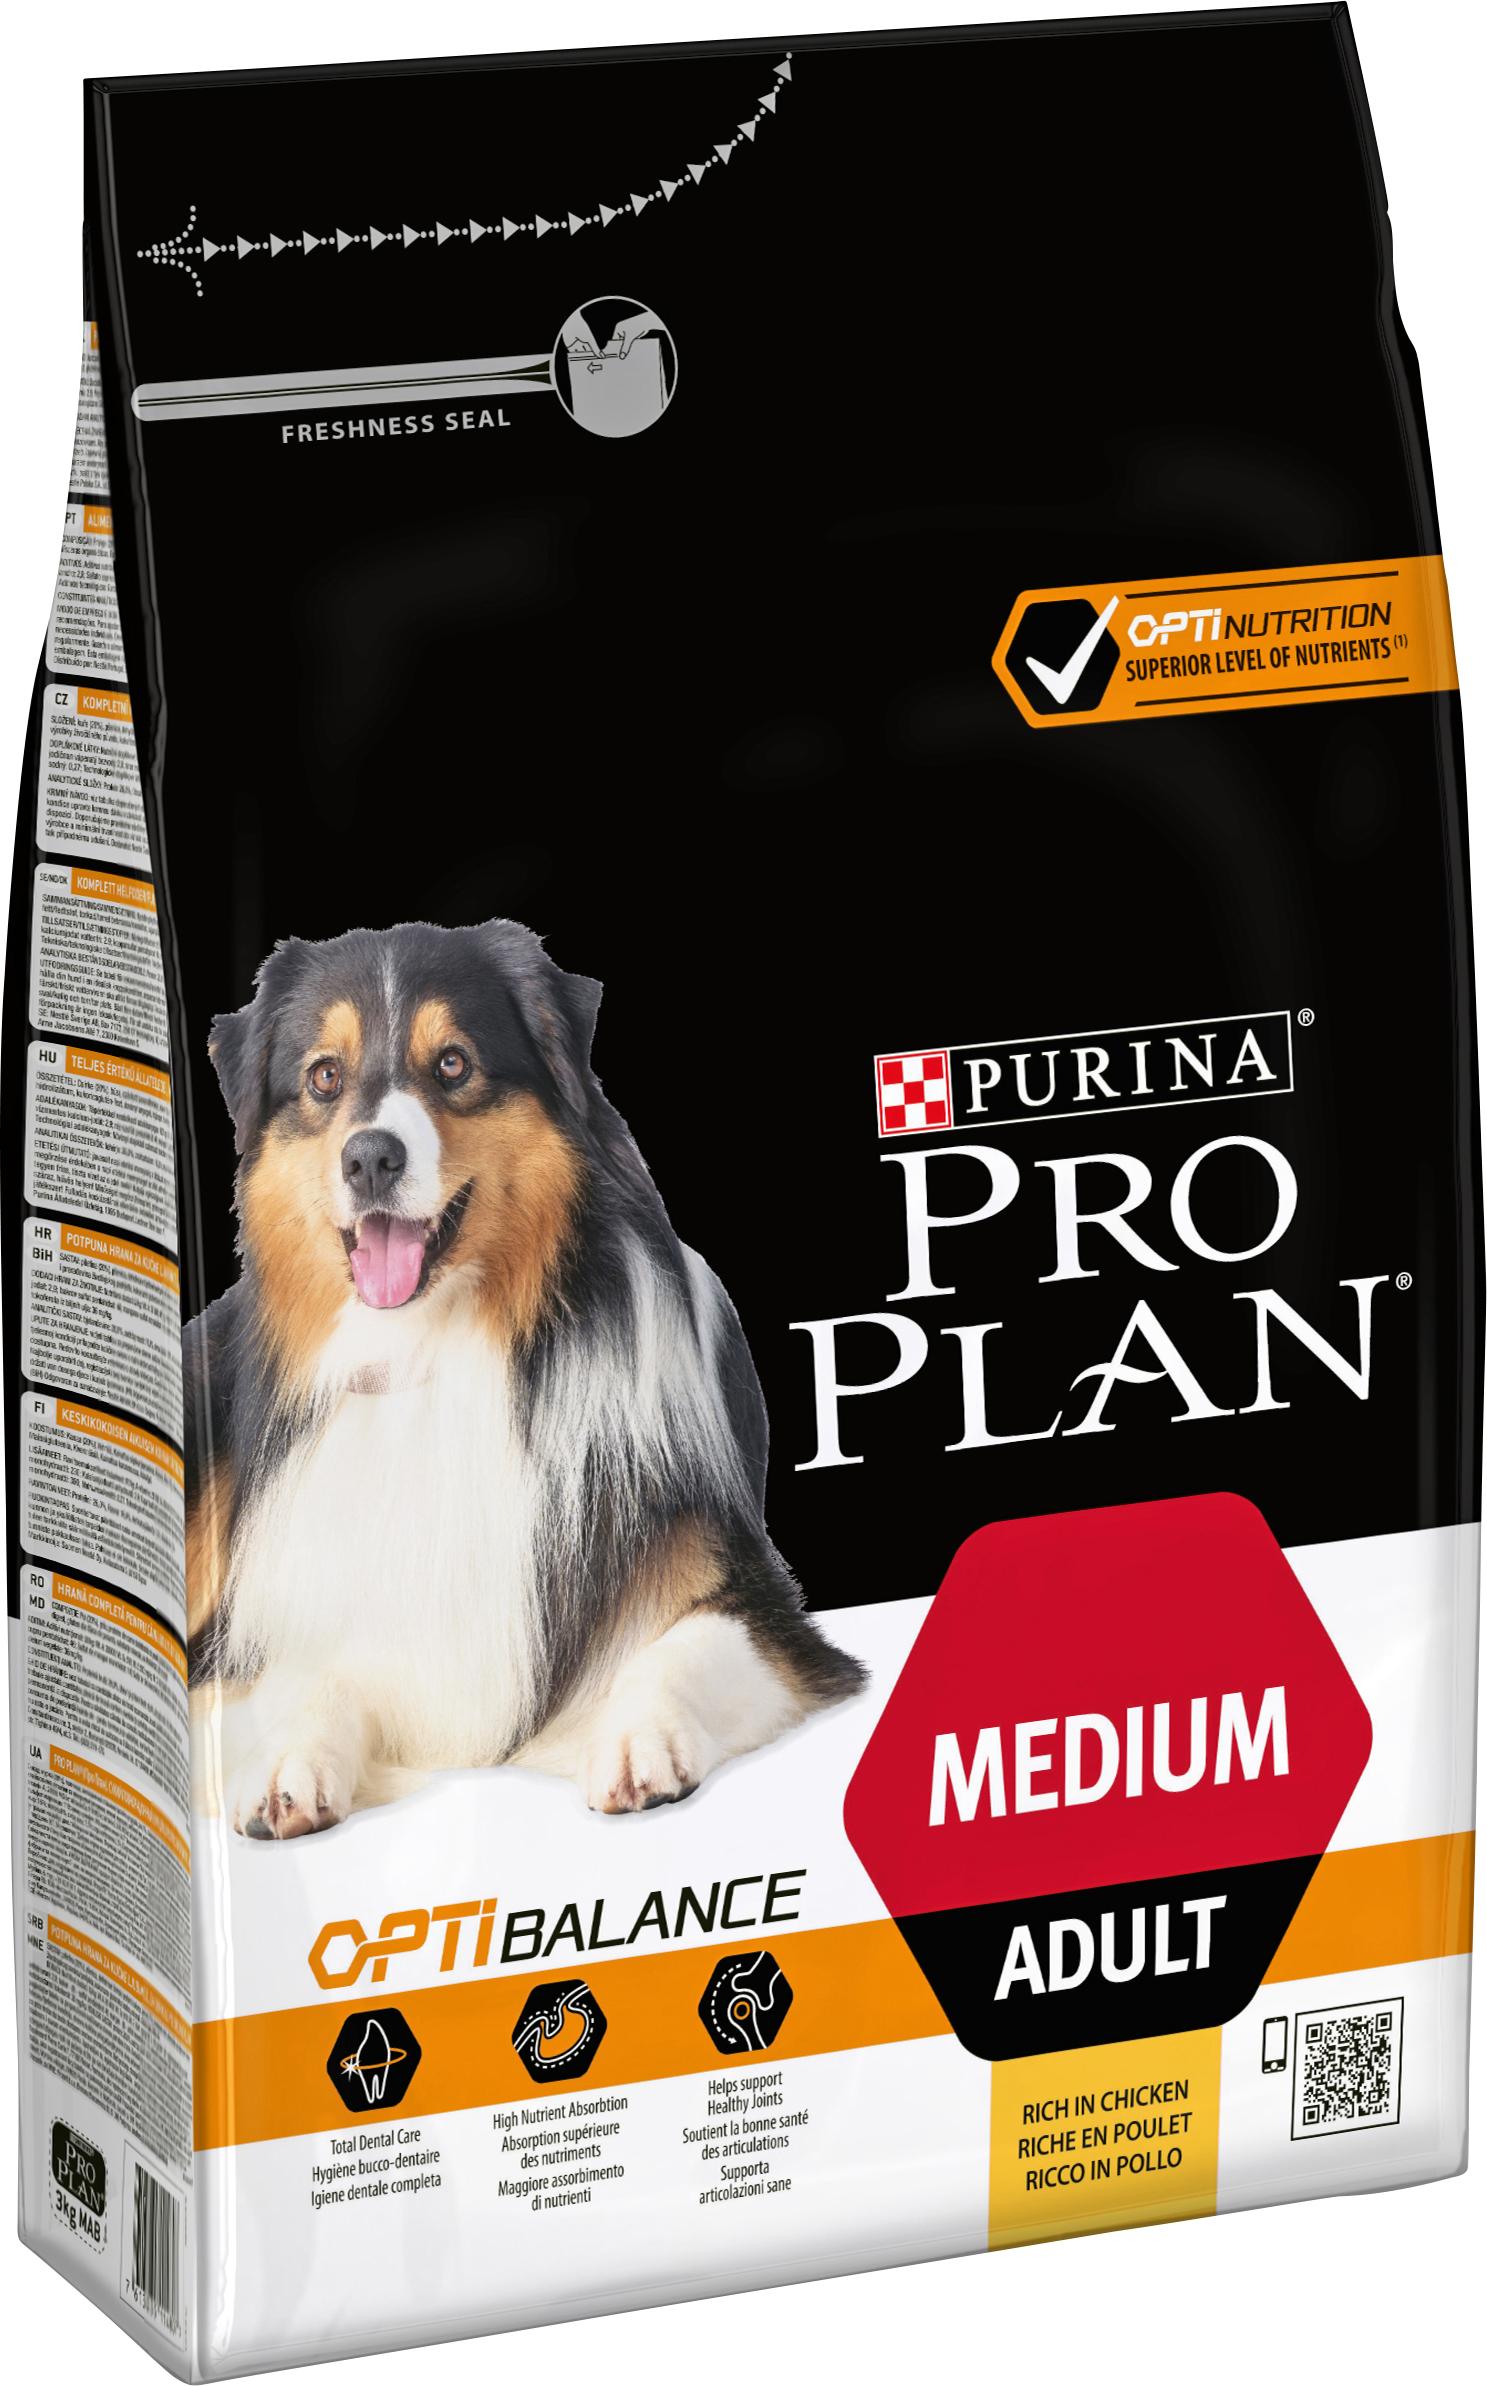 Hundfoder Pro Plan Medium Adult, 3 kg